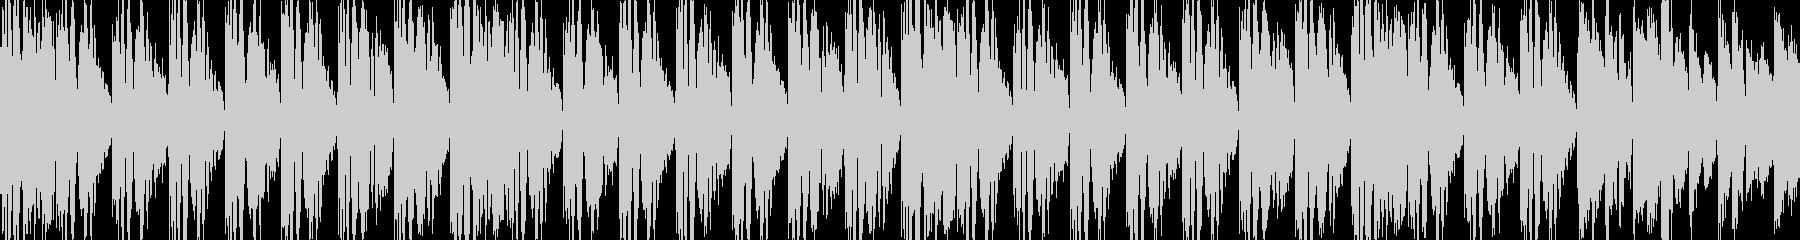 EDM ループの未再生の波形